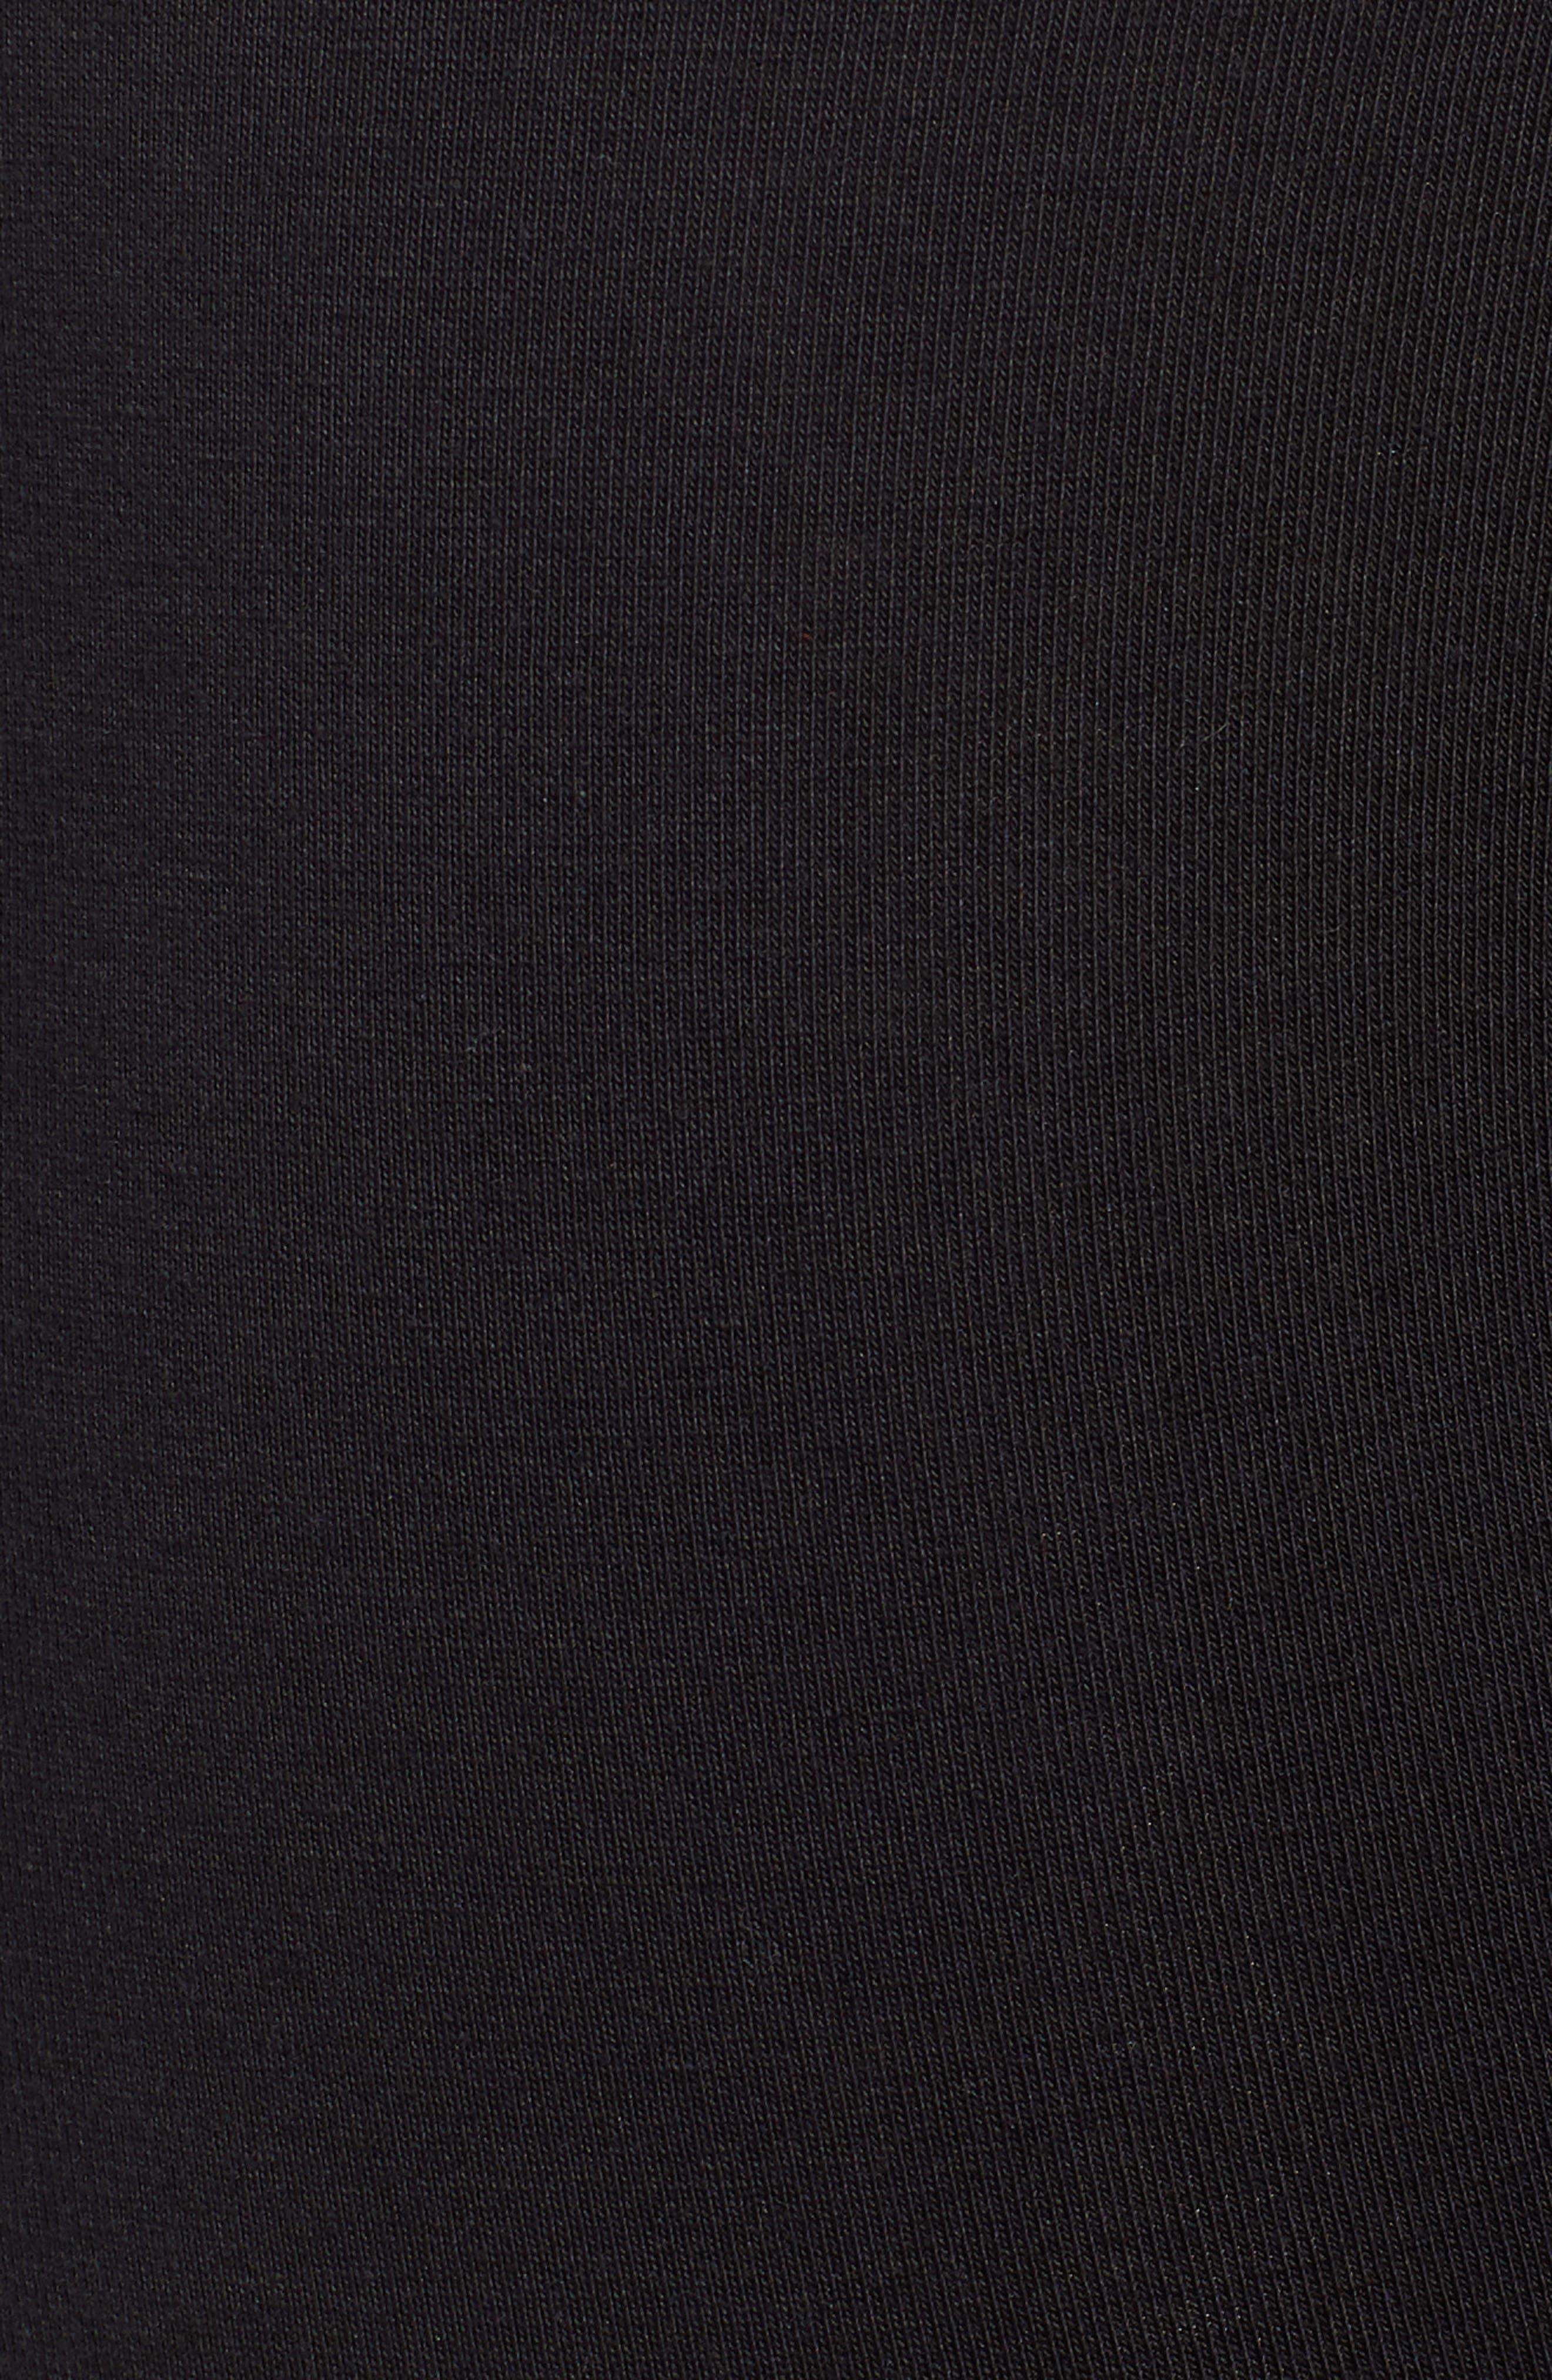 3-Pack Boxer Briefs,                             Alternate thumbnail 6, color,                             BLACK/ GREY/ BLUE/ RALEIGH